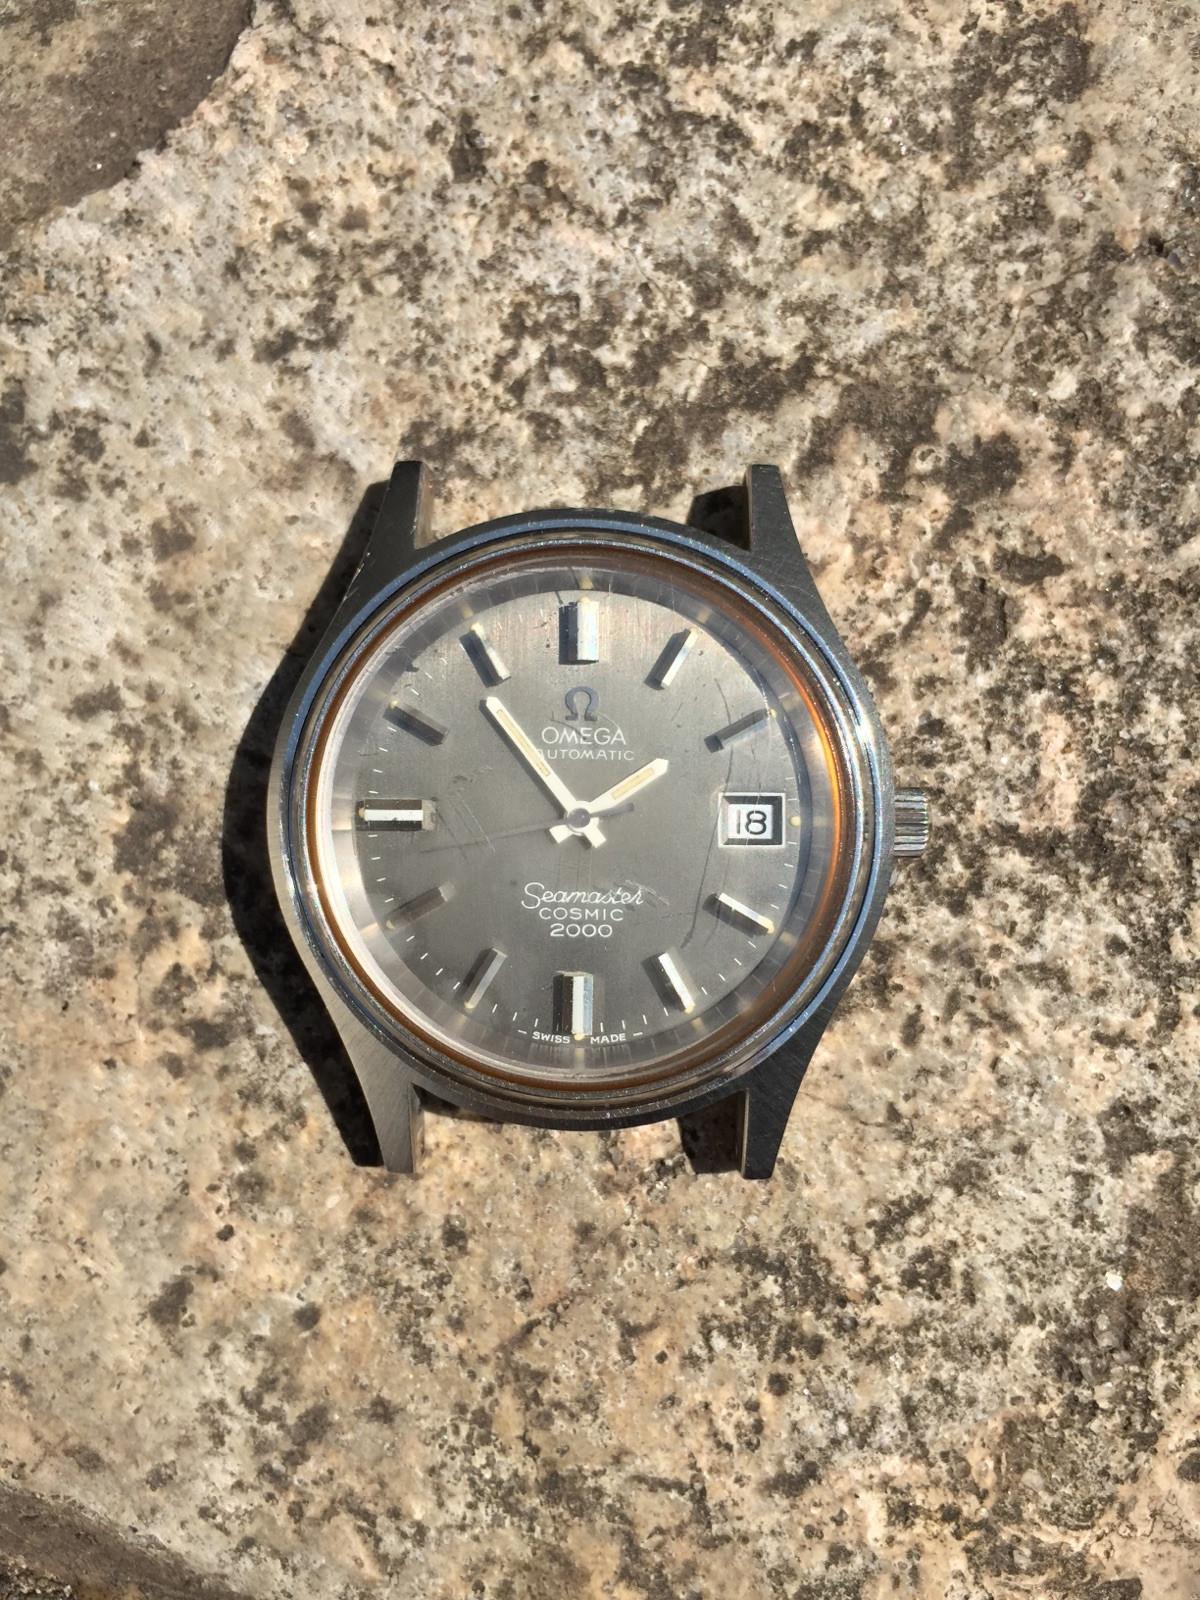 caf443df0f1 Omega Seamaster Cosmic 2000 Ref. 166.0128 relógio usados (€228 ...